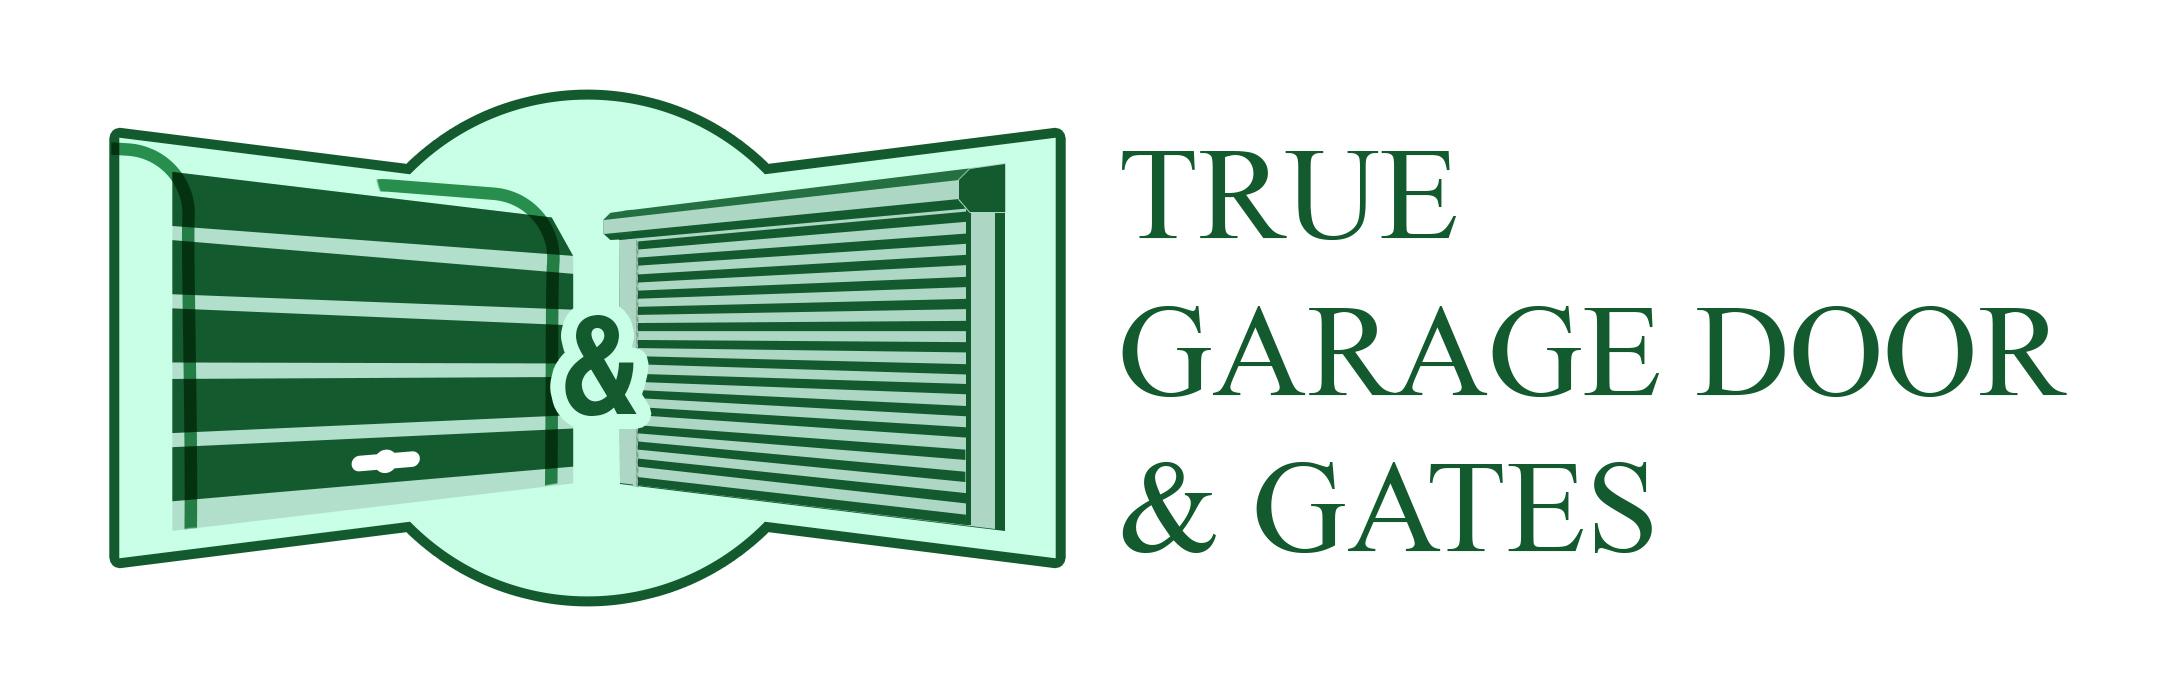 True Gate Service NY | Rolling Gate Service NYC